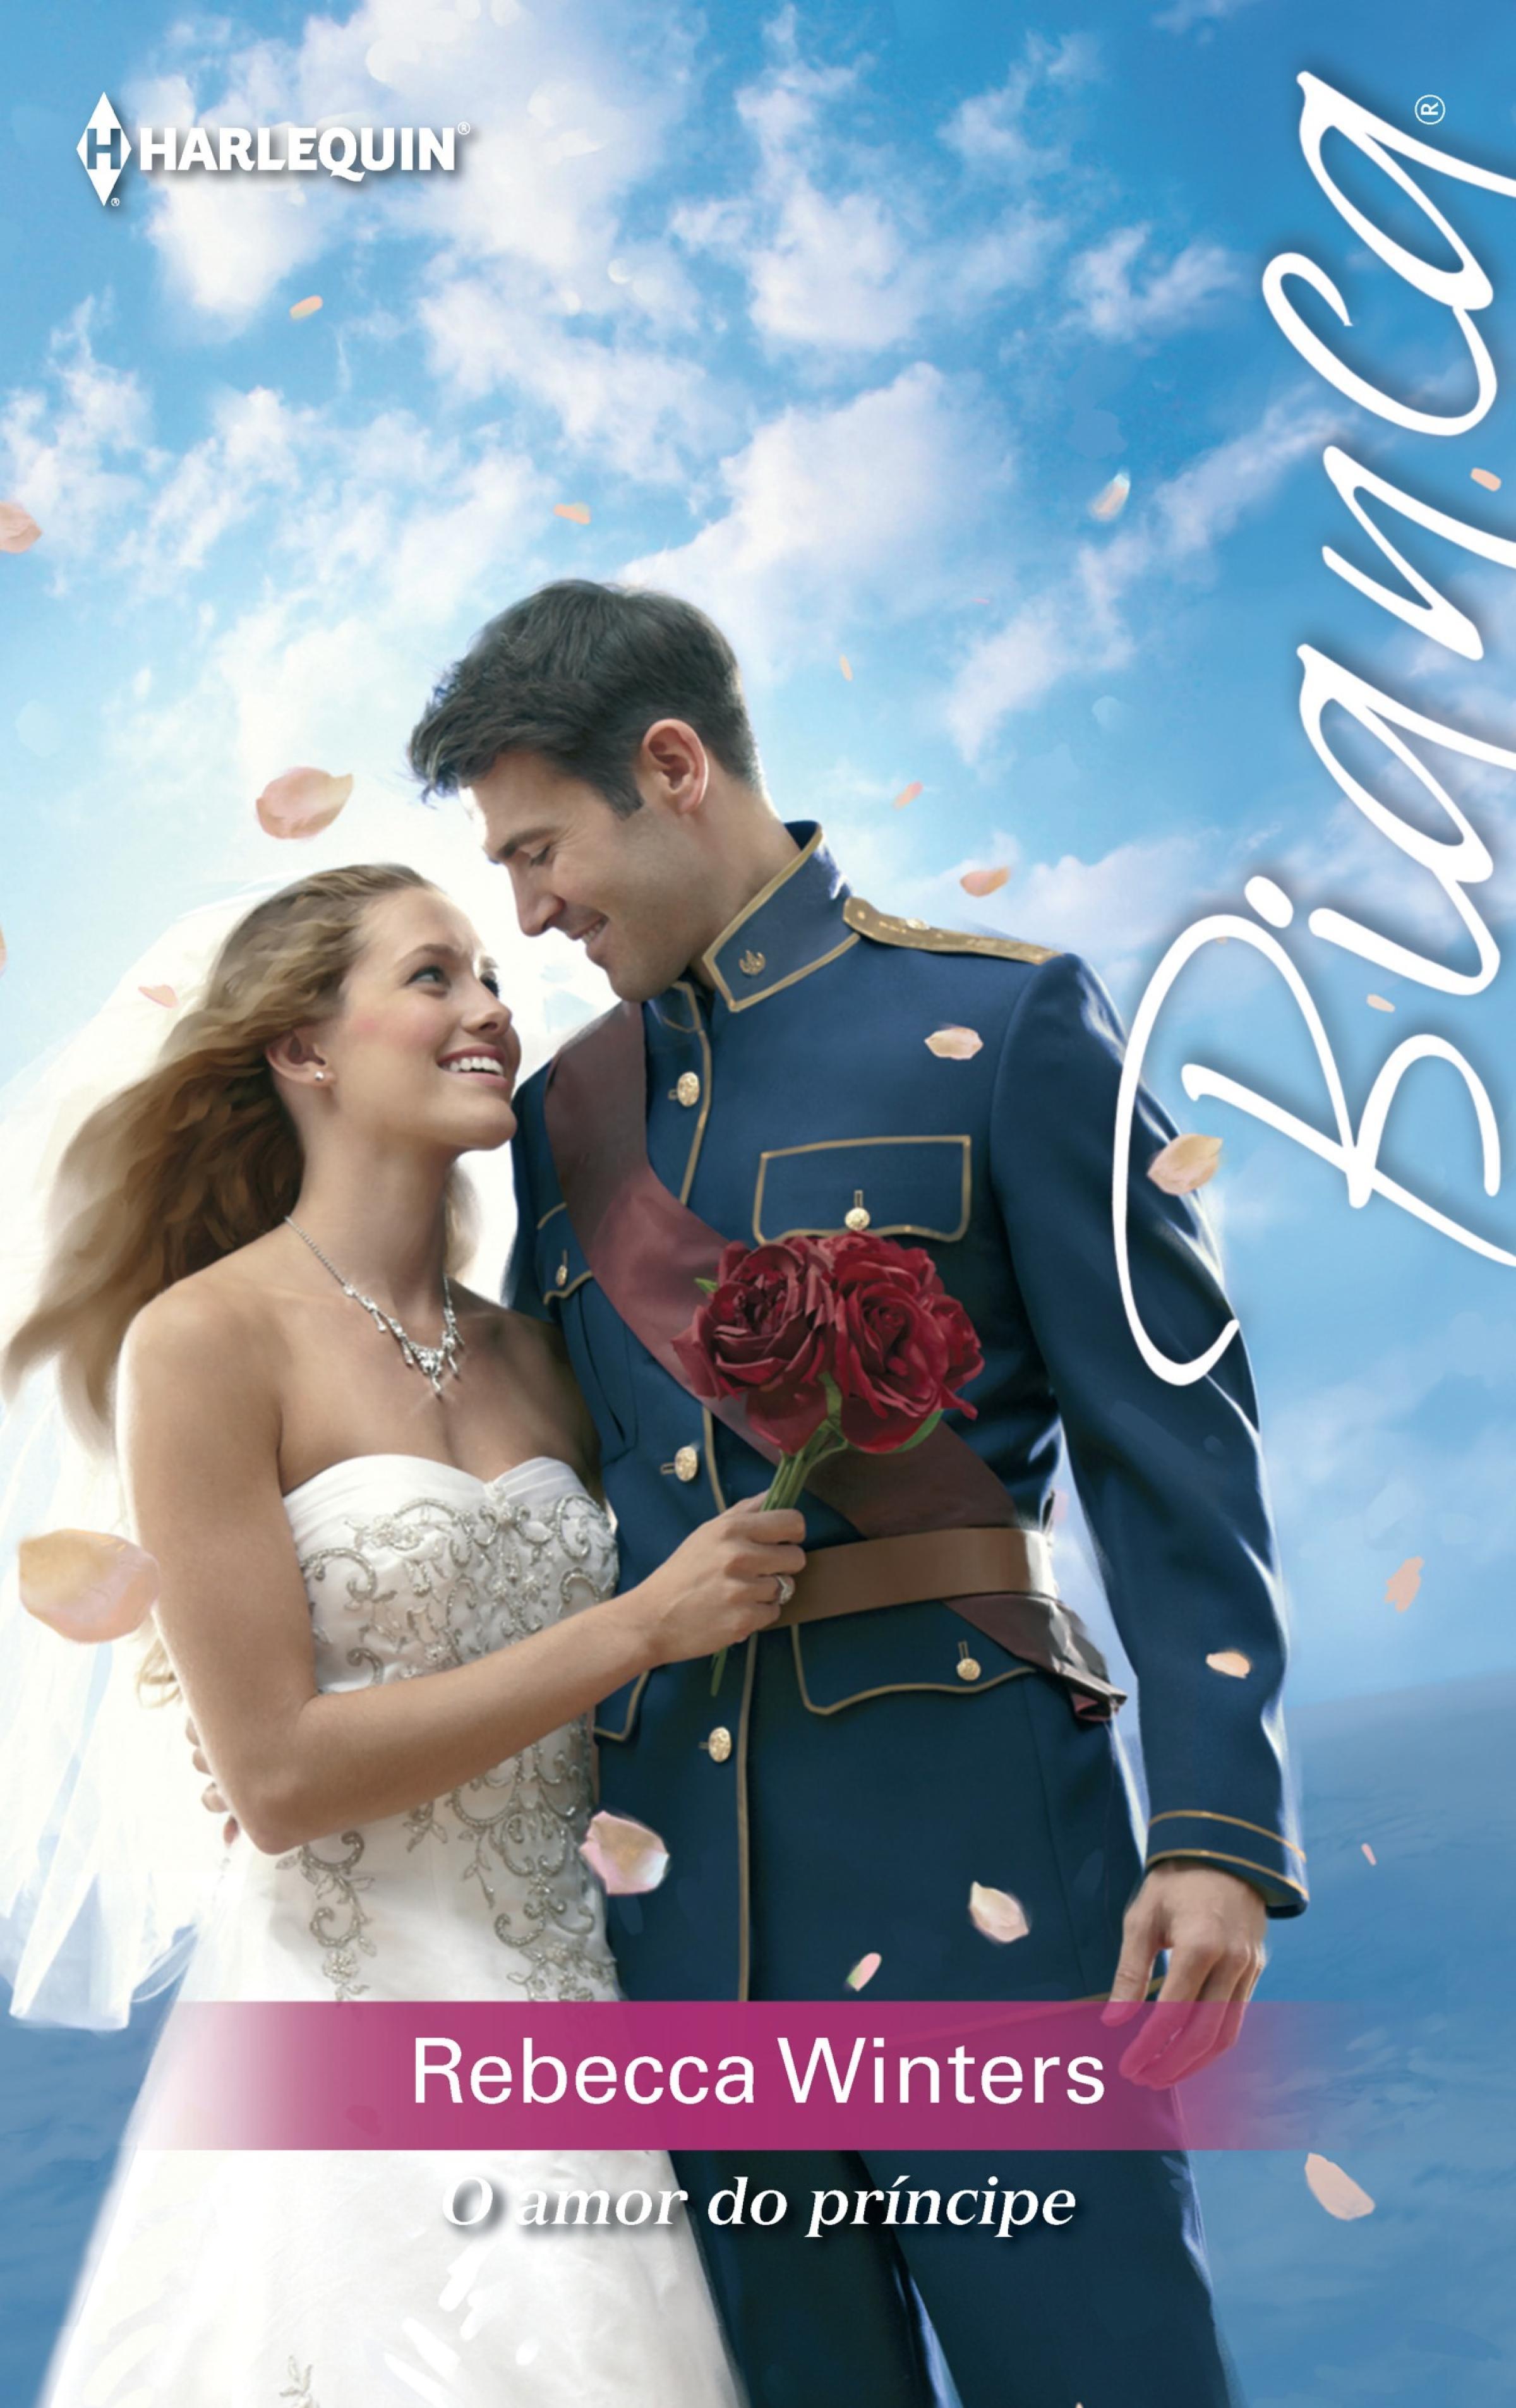 Rebecca Winters O amor do príncipe rebecca winters snowbound with her hero